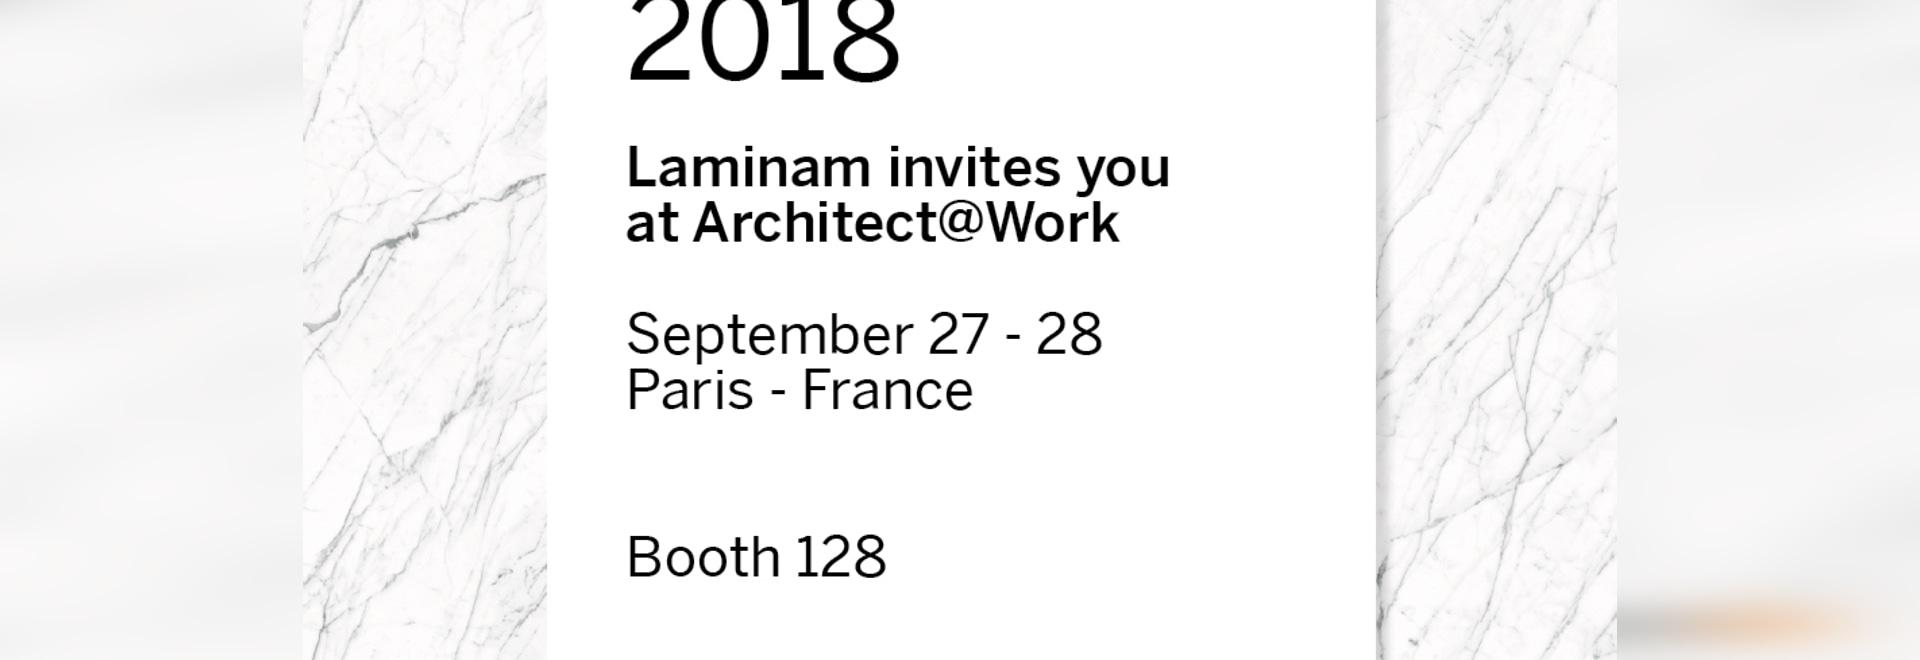 LAMINAM INNOVATION ON STAGE AT ARCHITECT@WORK PARIS